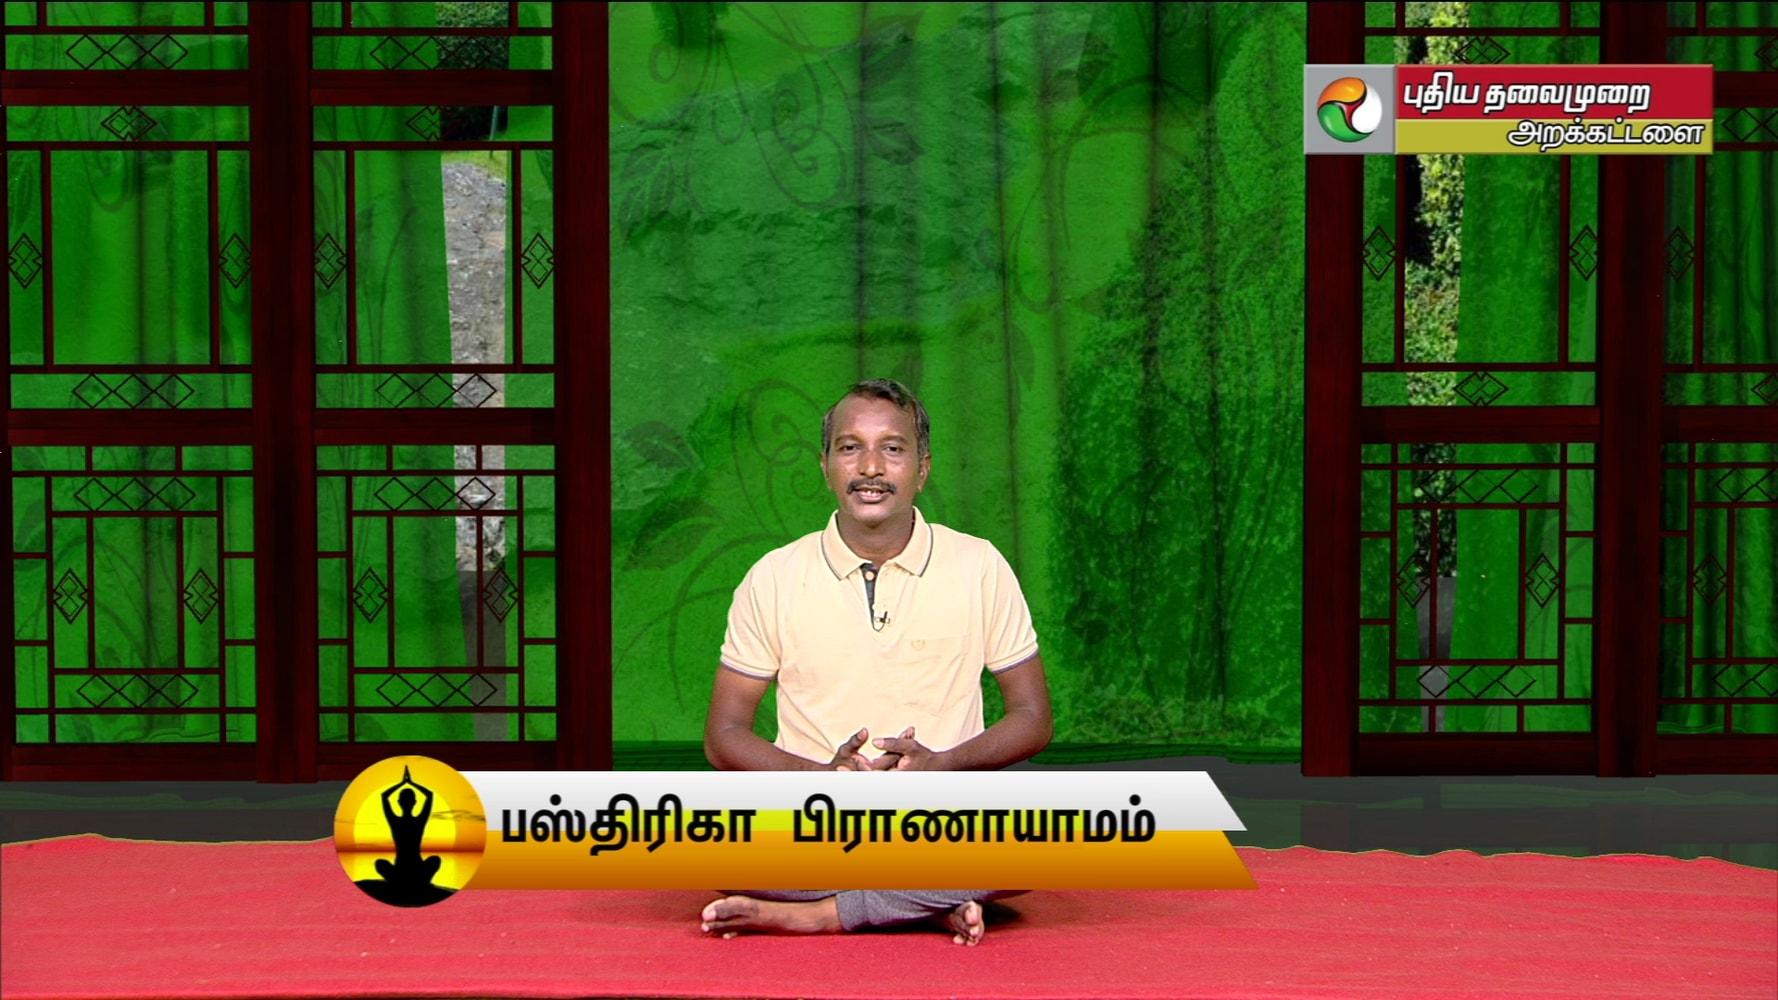 Webinar on Yoga Online Training Camp ( June 23-26,2021) (9)